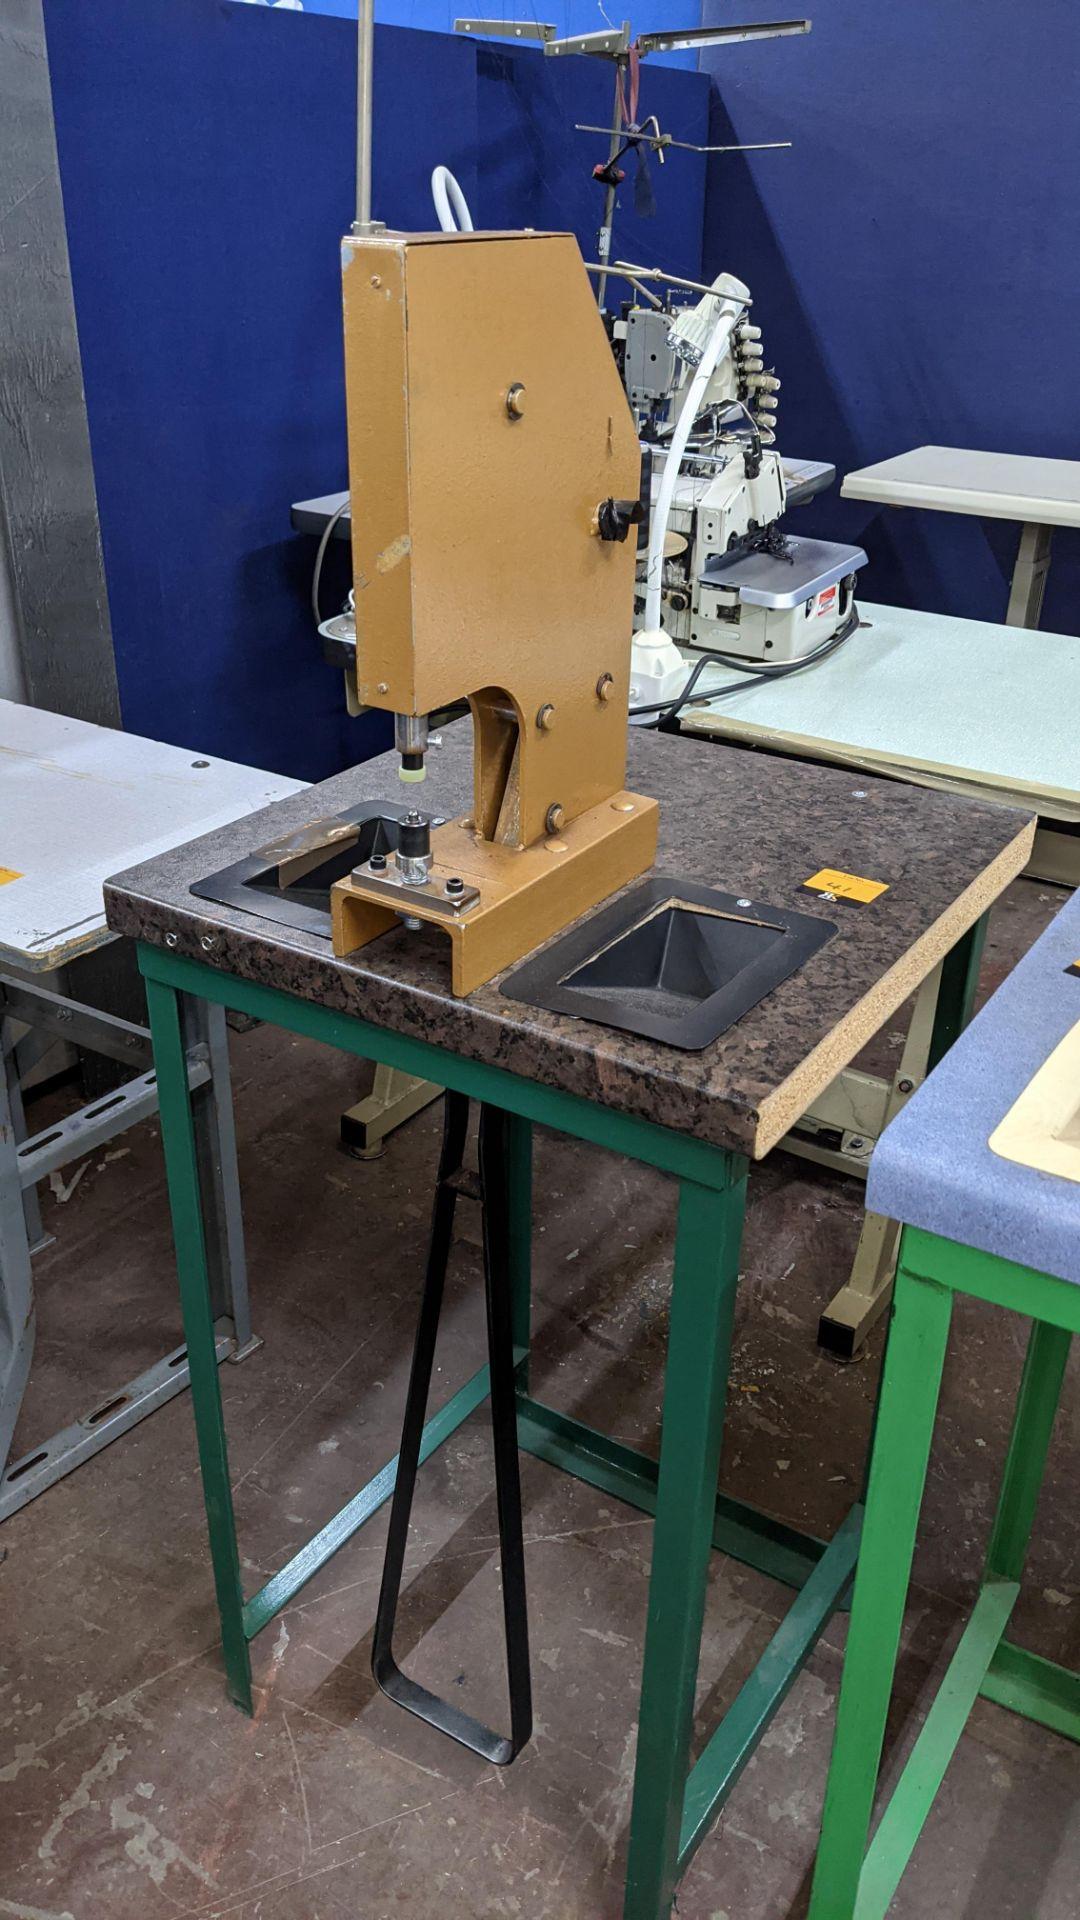 Foot operated riveting machine/press stud machine - Image 2 of 9